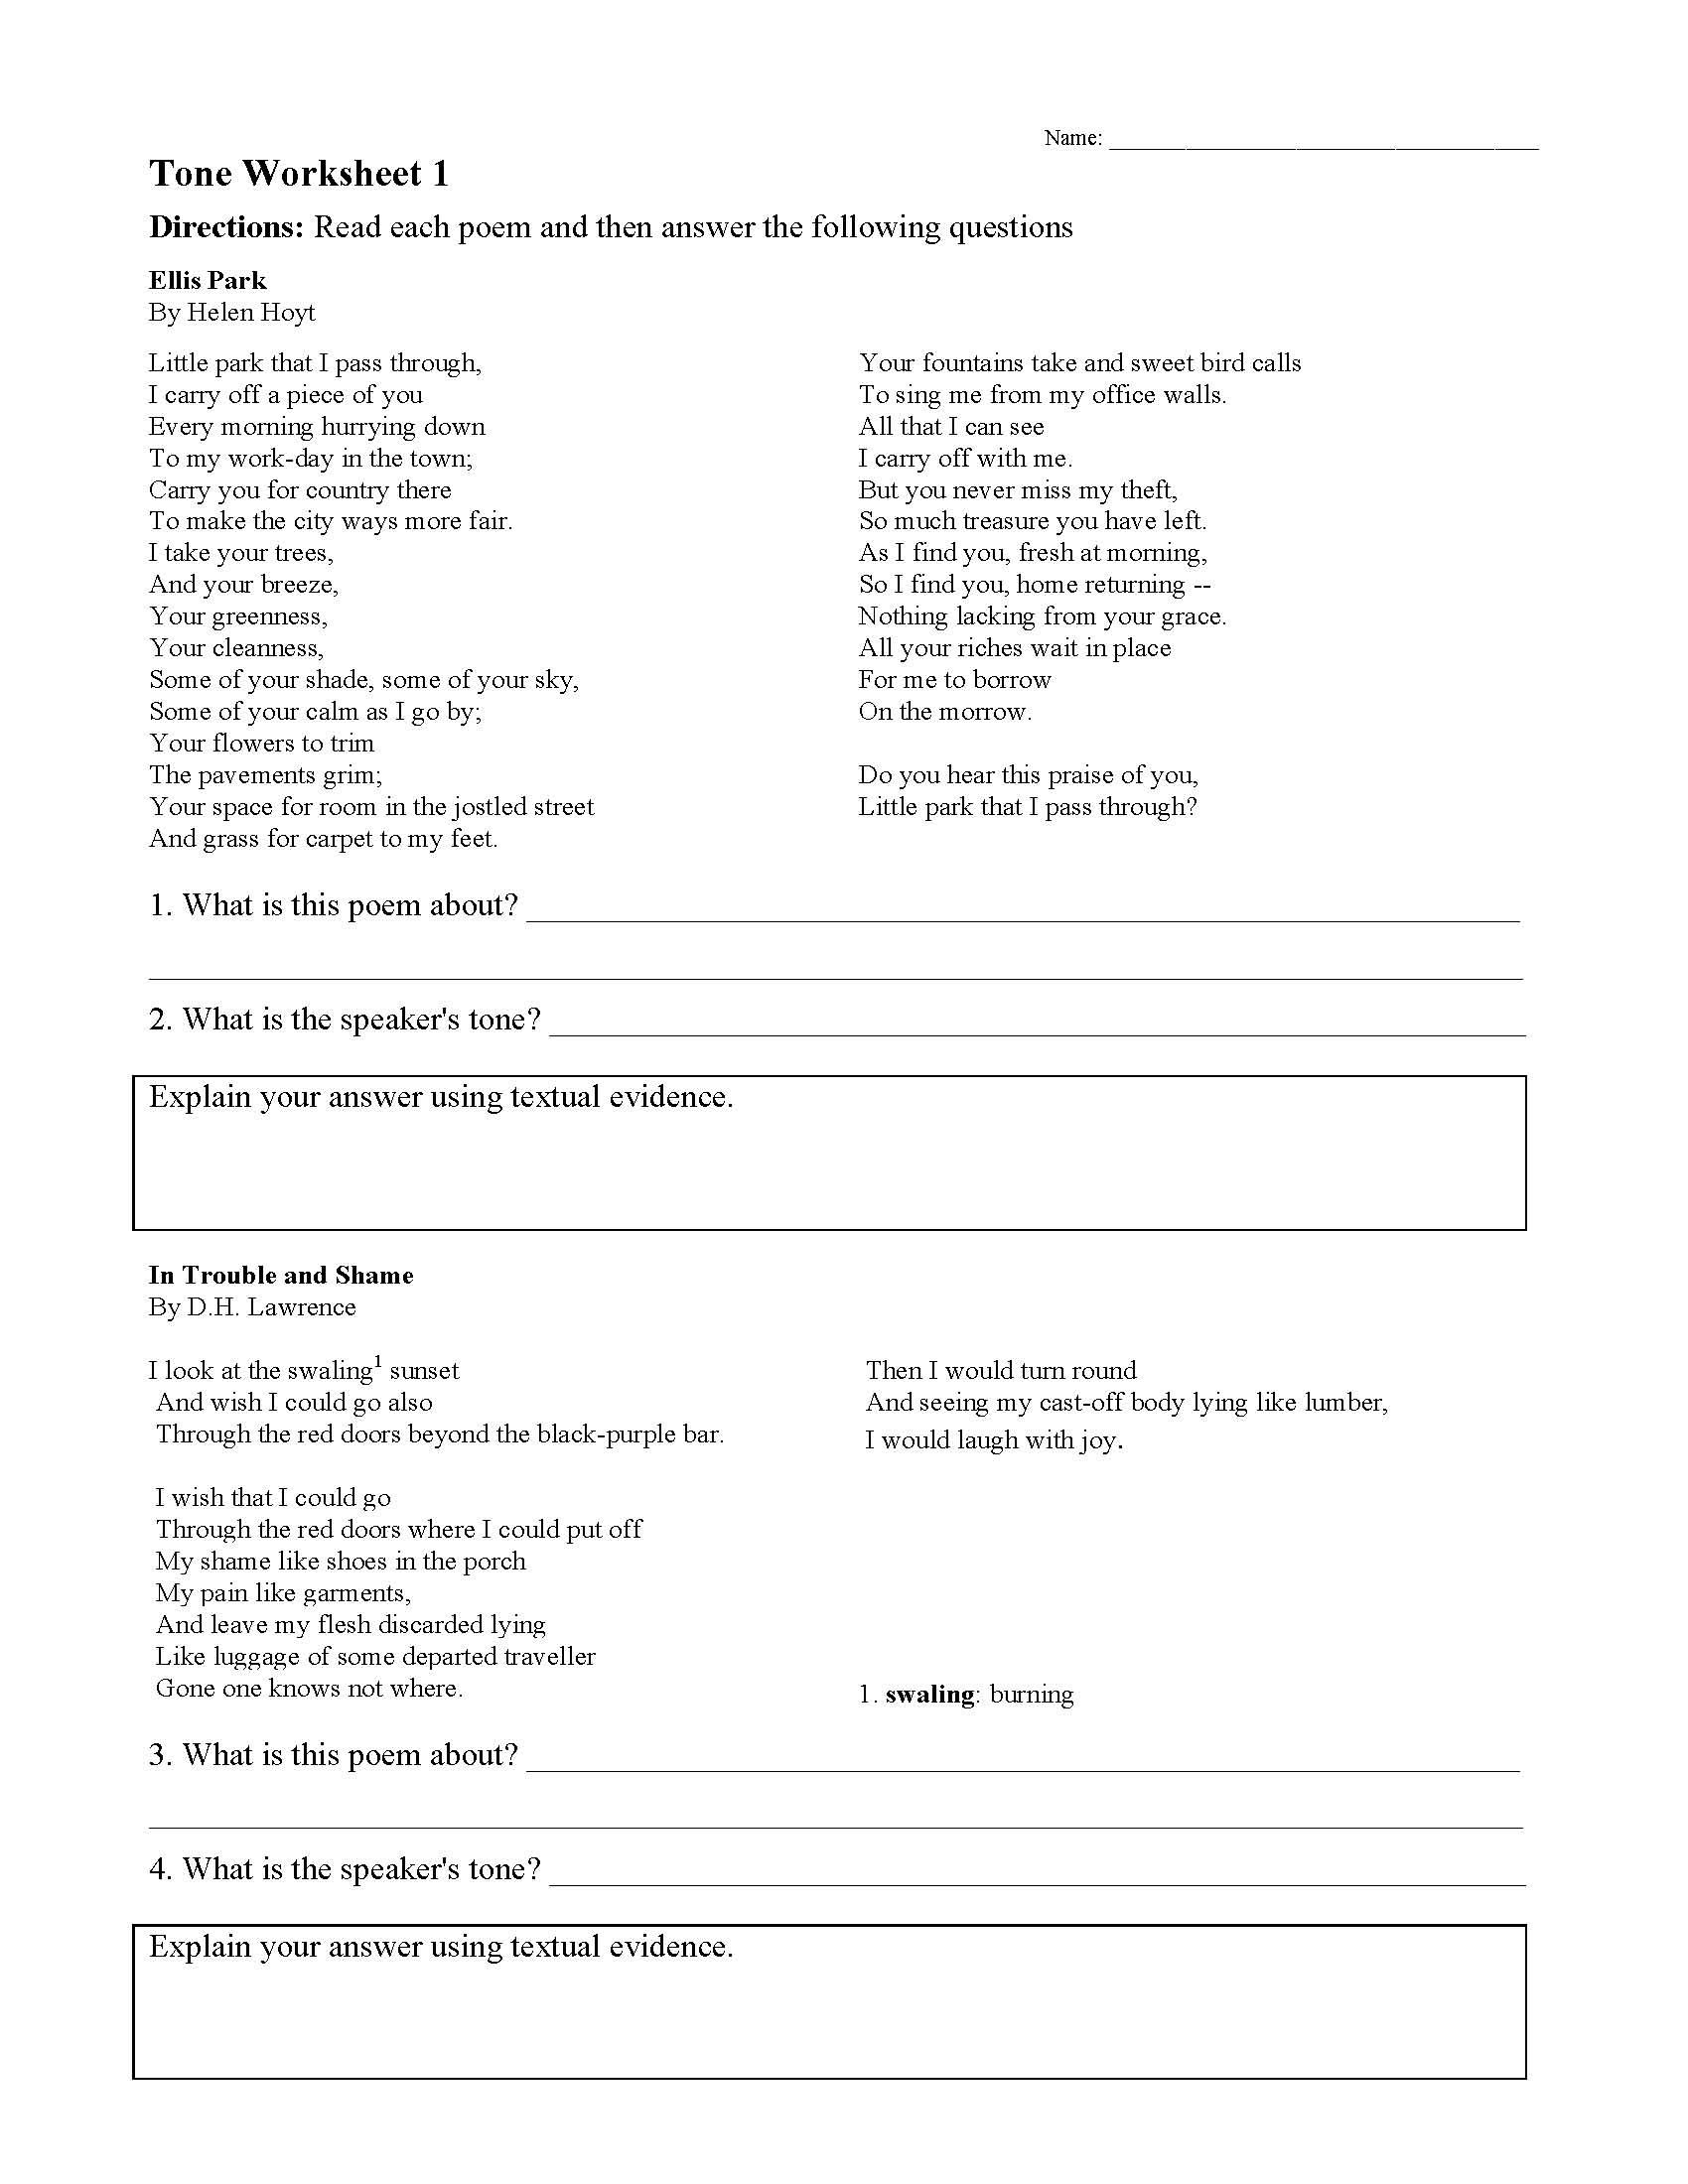 Tone Worksheet 1